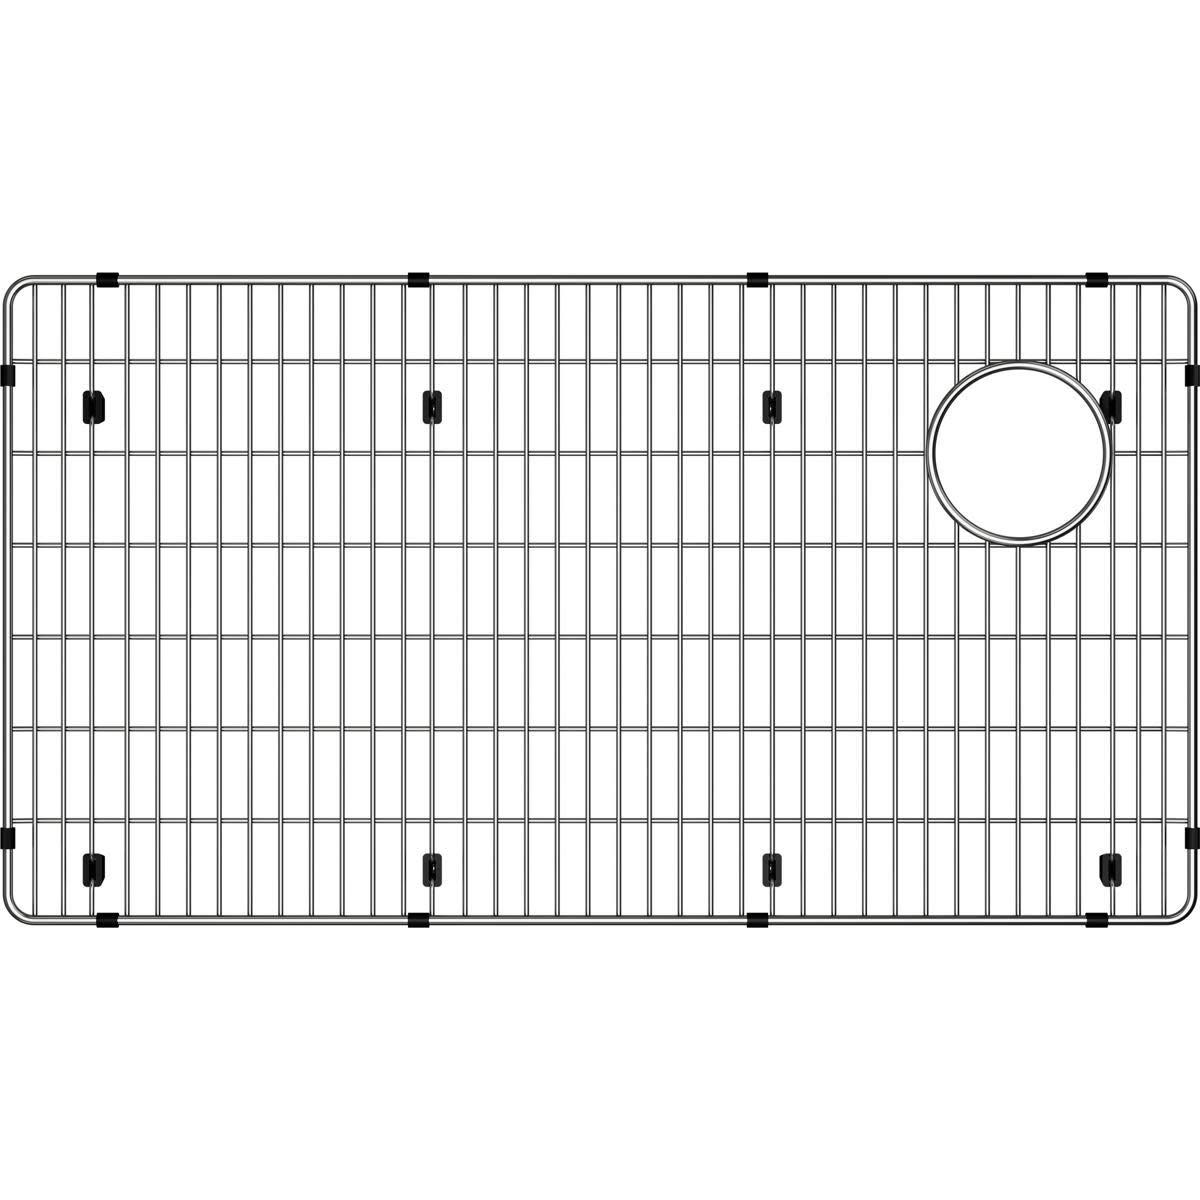 Elkay CTXBG2815 Crosstown 28-1/2'' L x 15-1/2'' W Stainless Steel Basin Rack